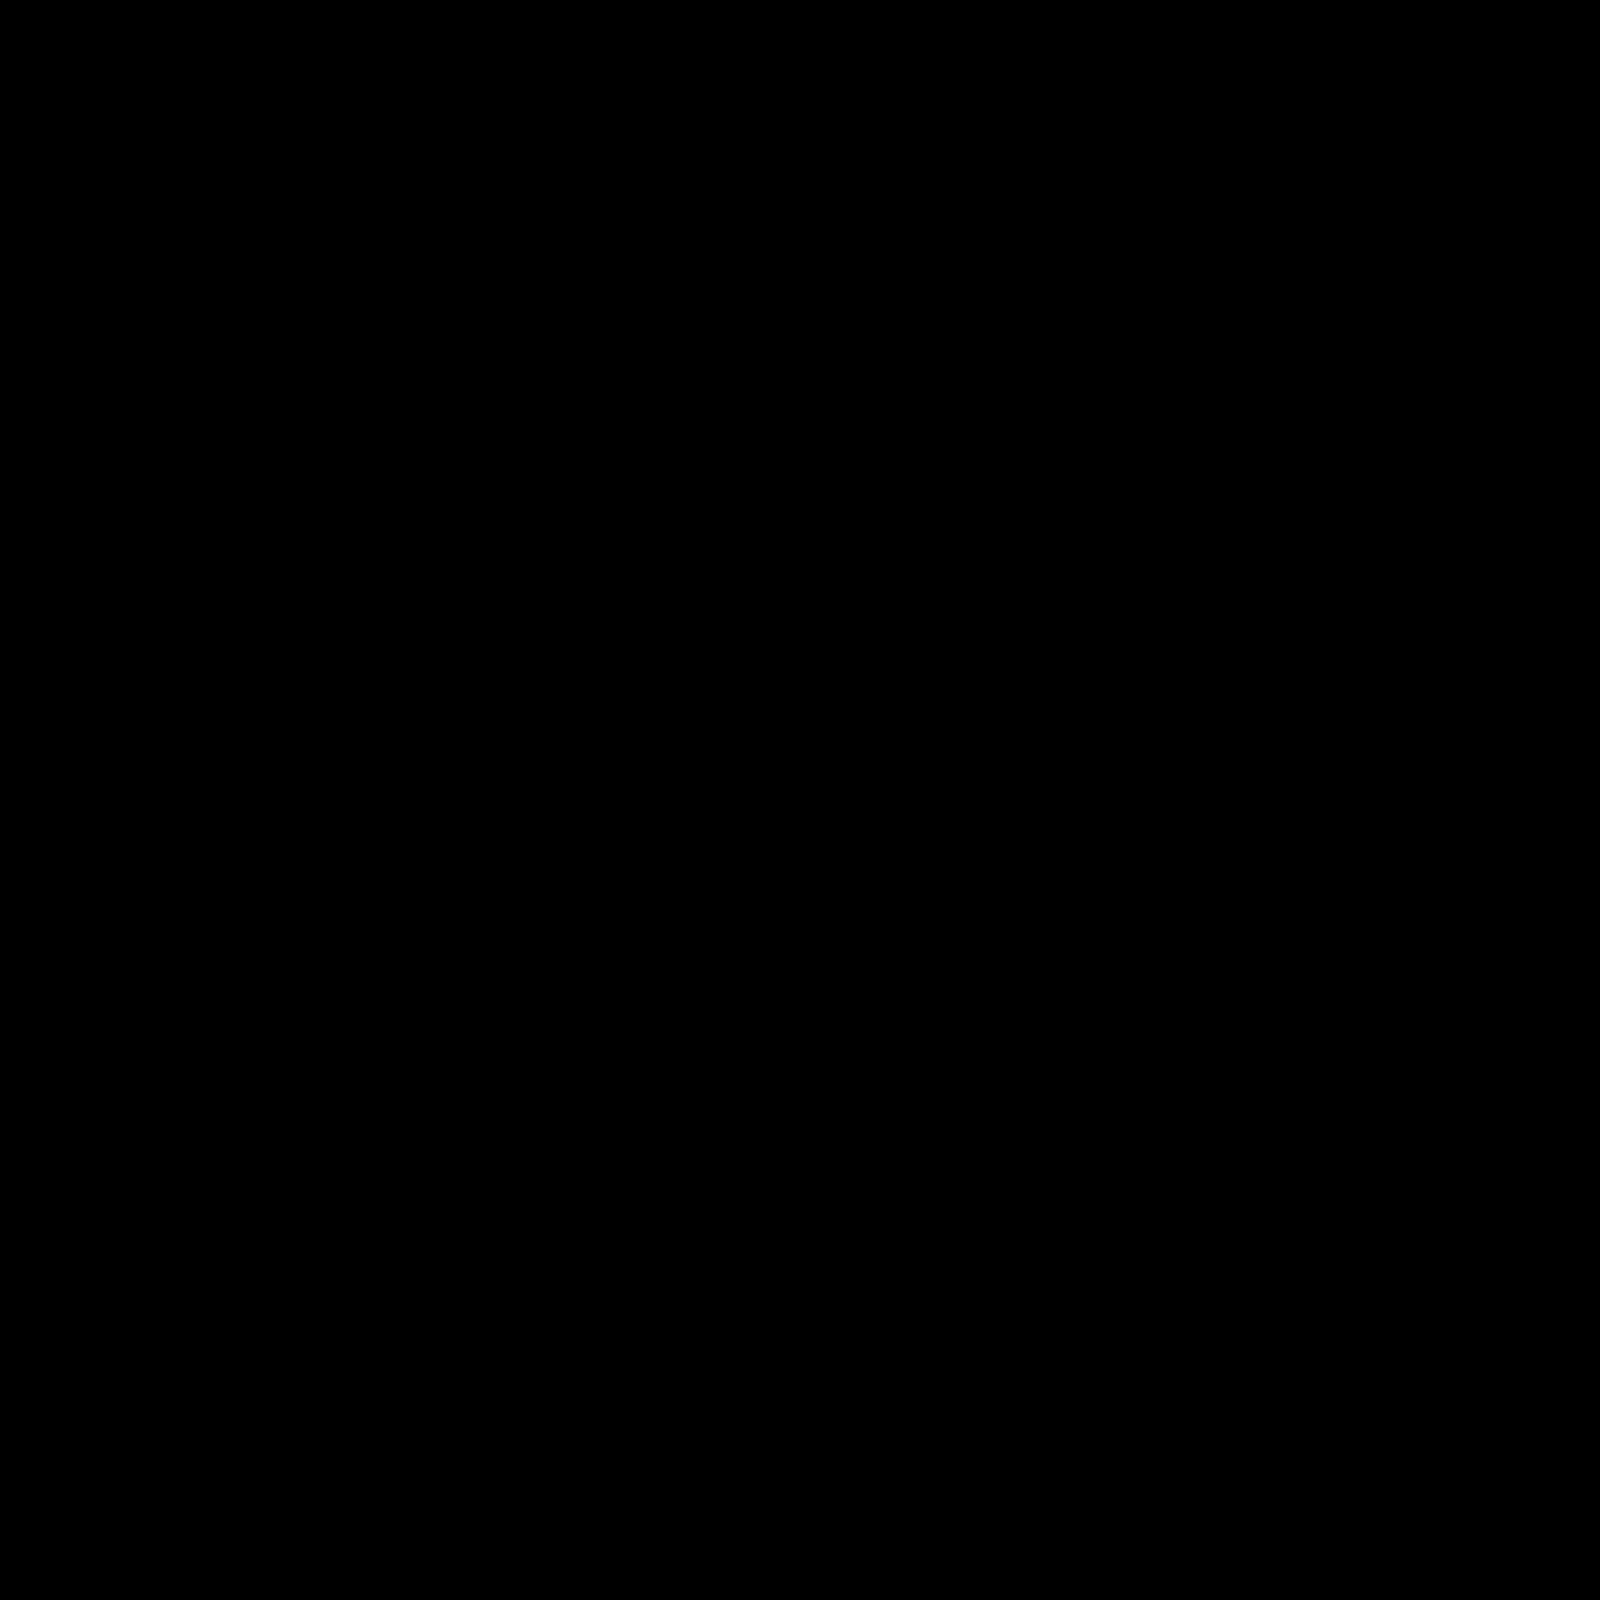 1600x1600 Computer Icon